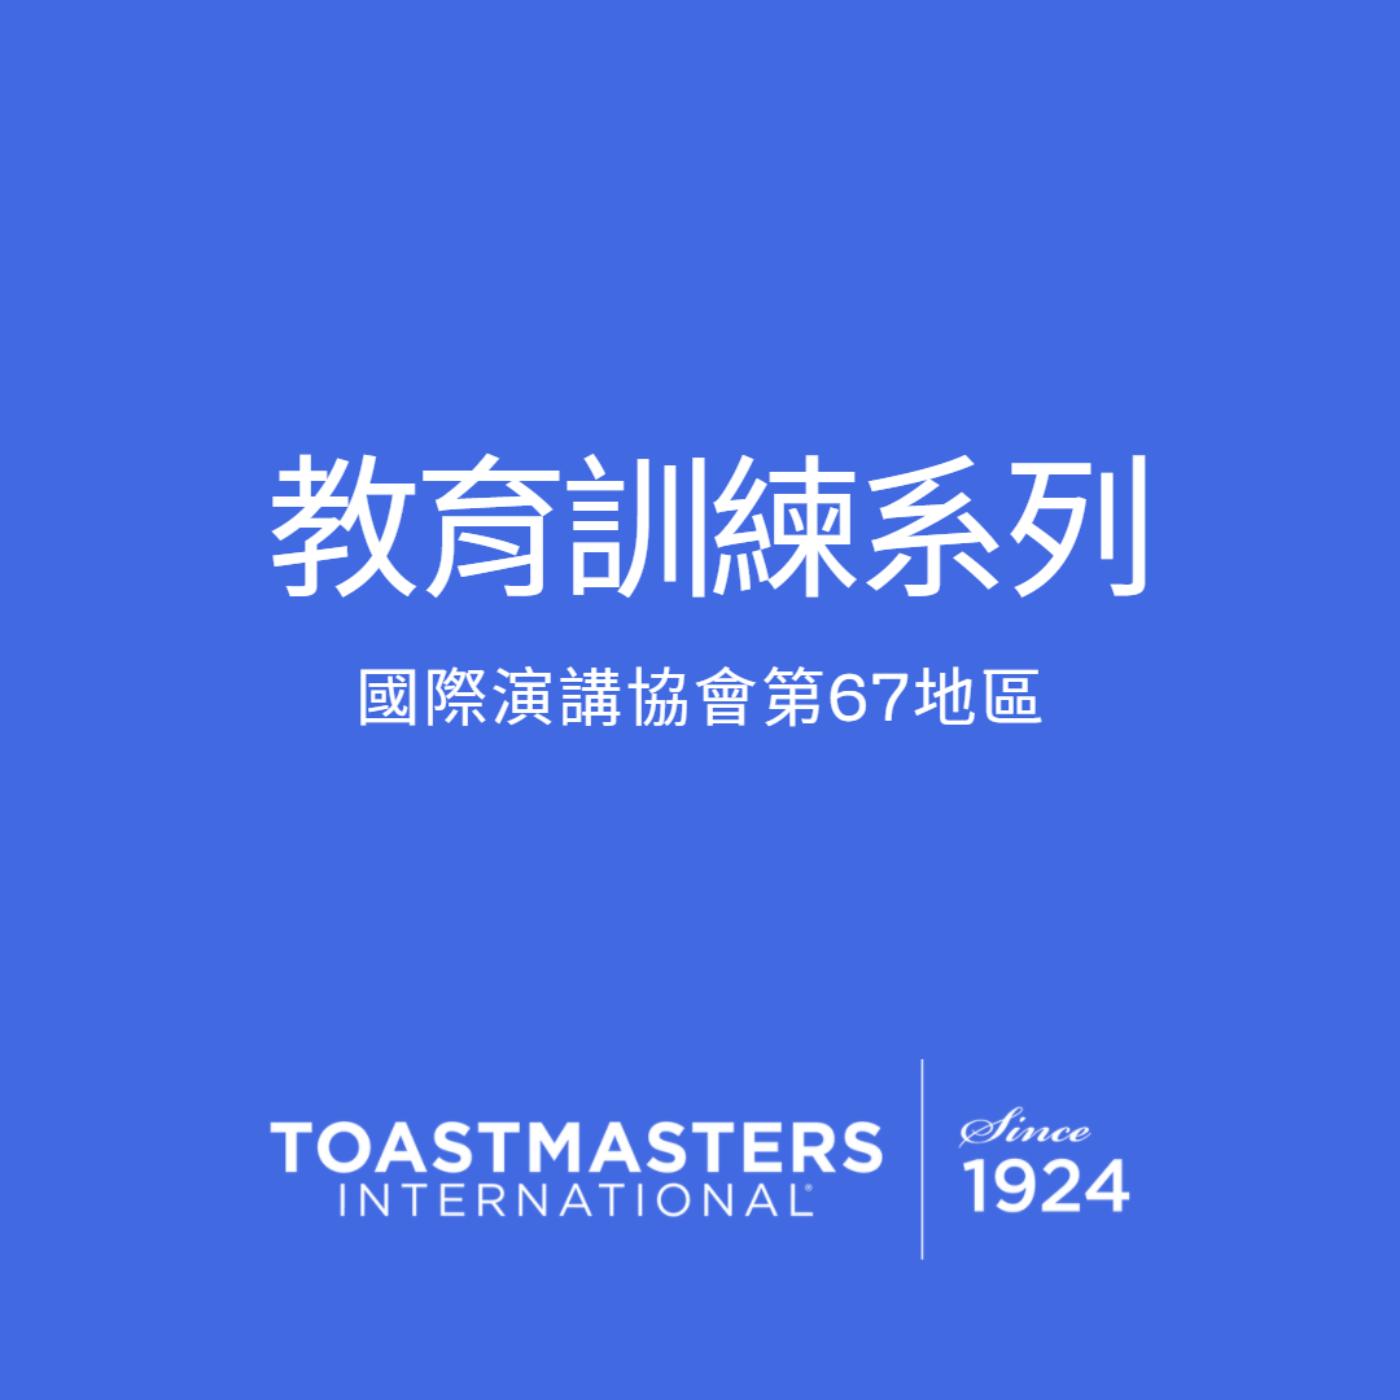 D67 Toastmasters國際演講協會第67地區-教育訓練系列